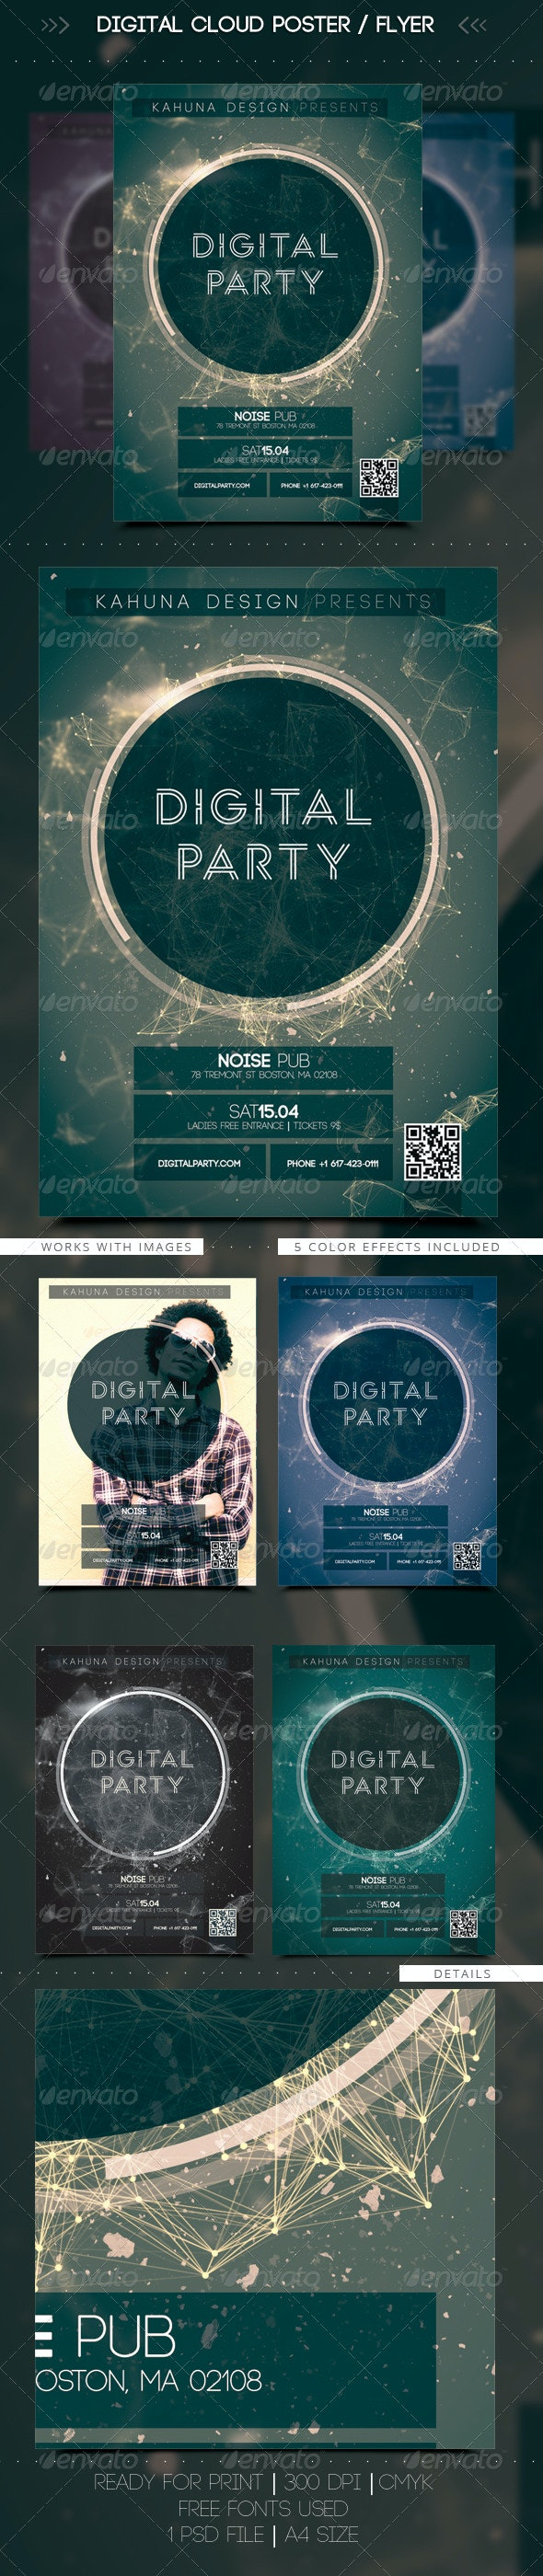 Digital Cloud Poster / Flyer - Clubs & Parties Events